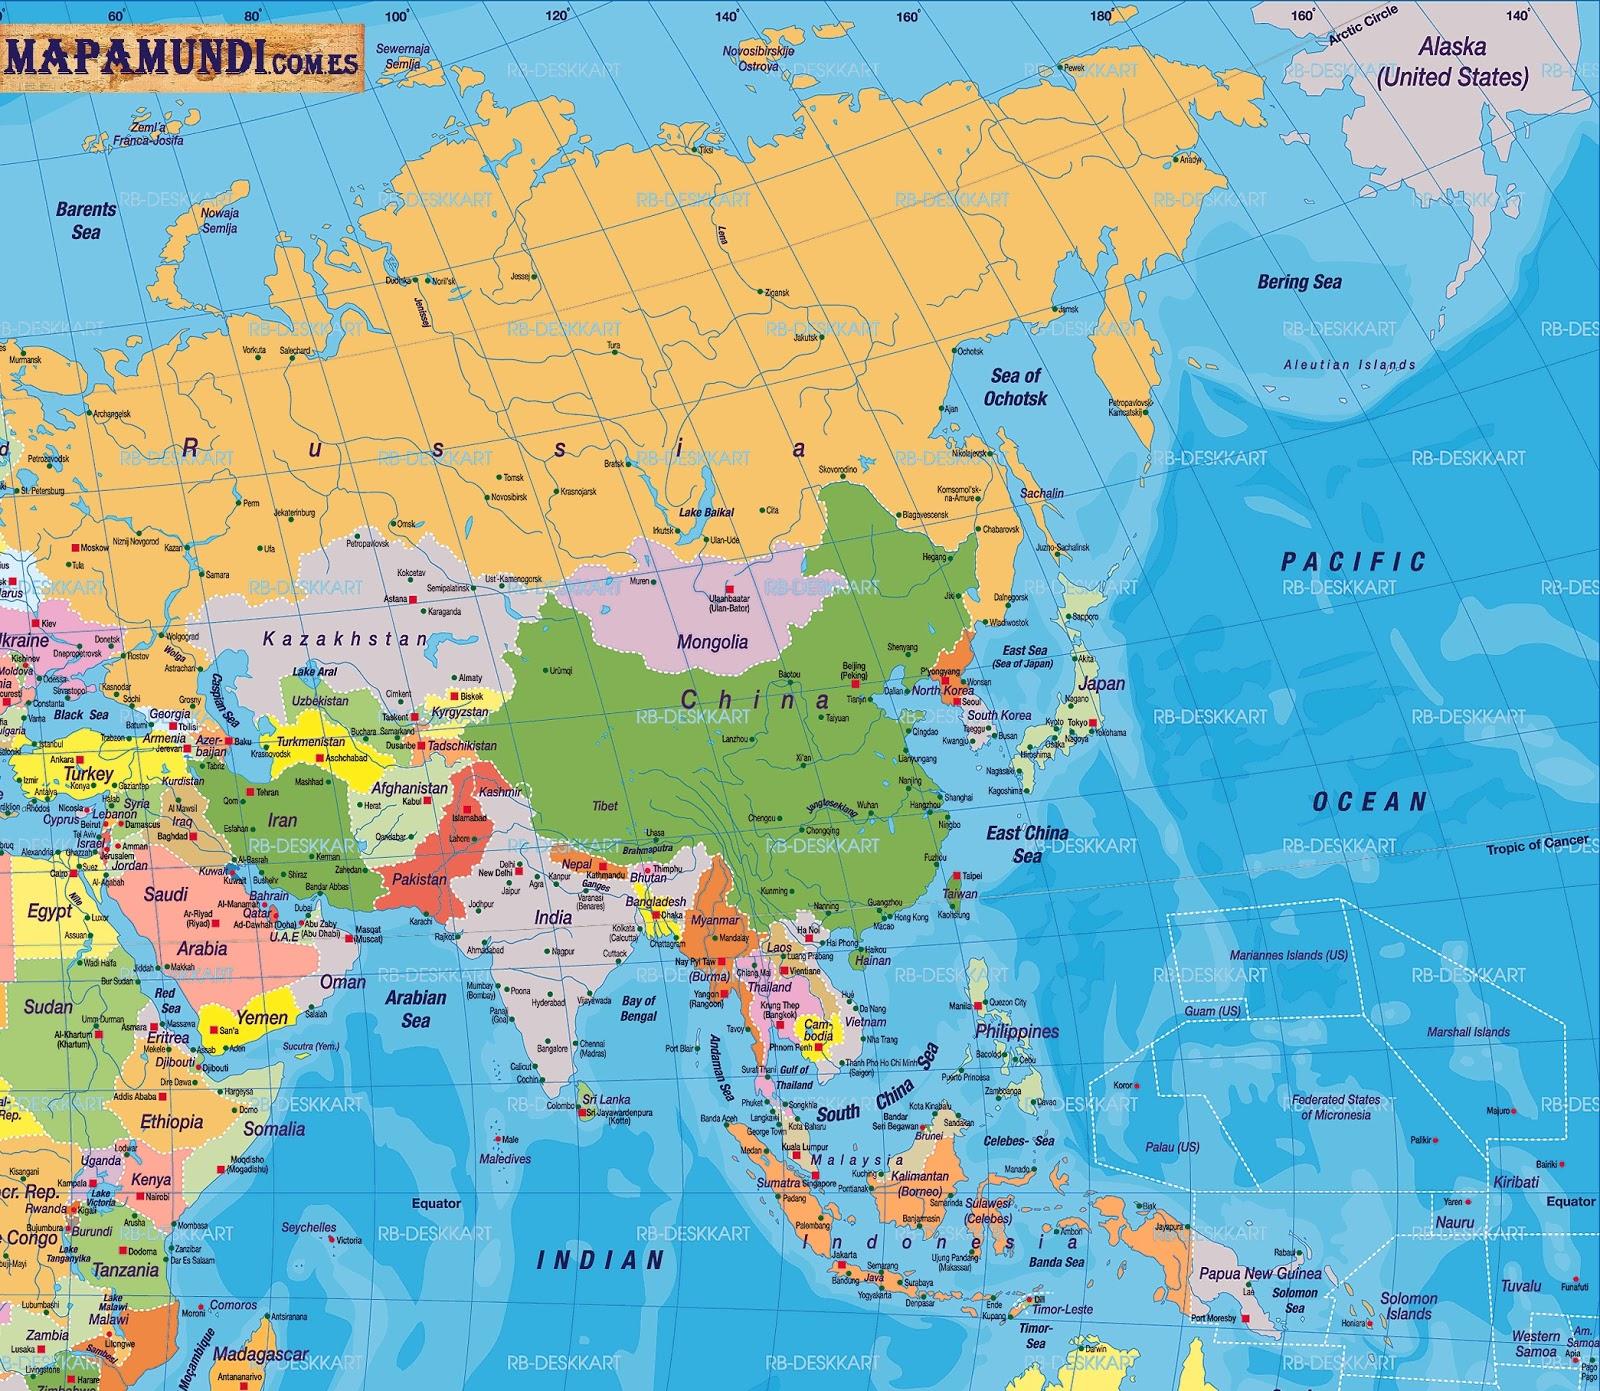 Mapa Mundo Asia - Mapa de united states